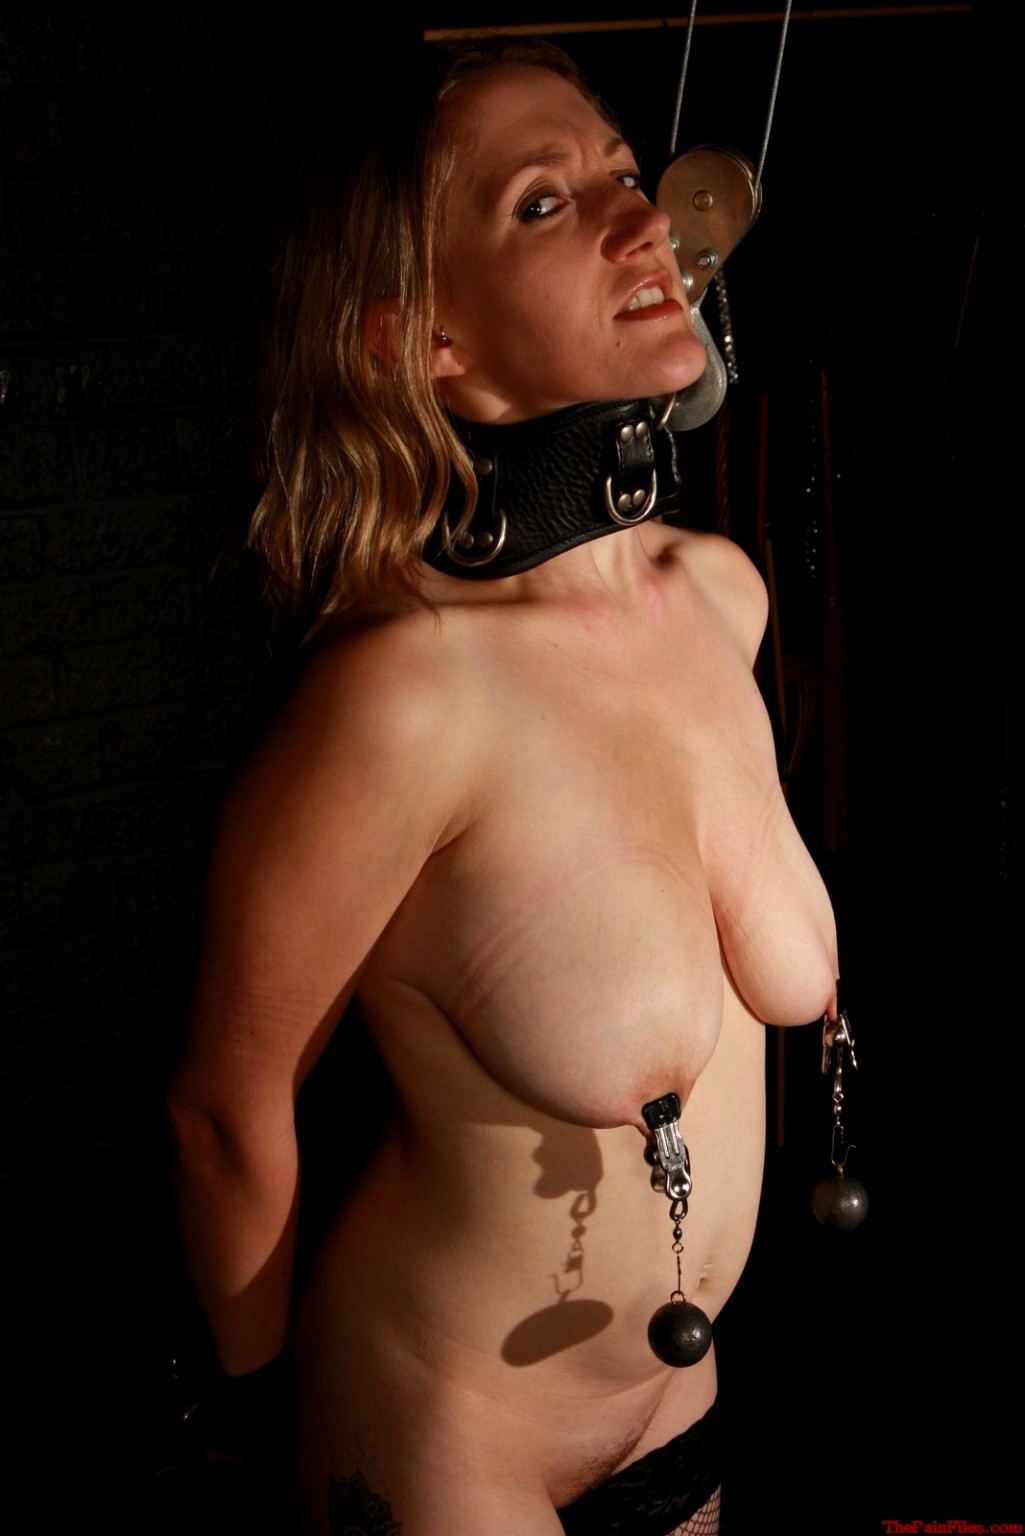 Tumblr Nipple Clamp Torture